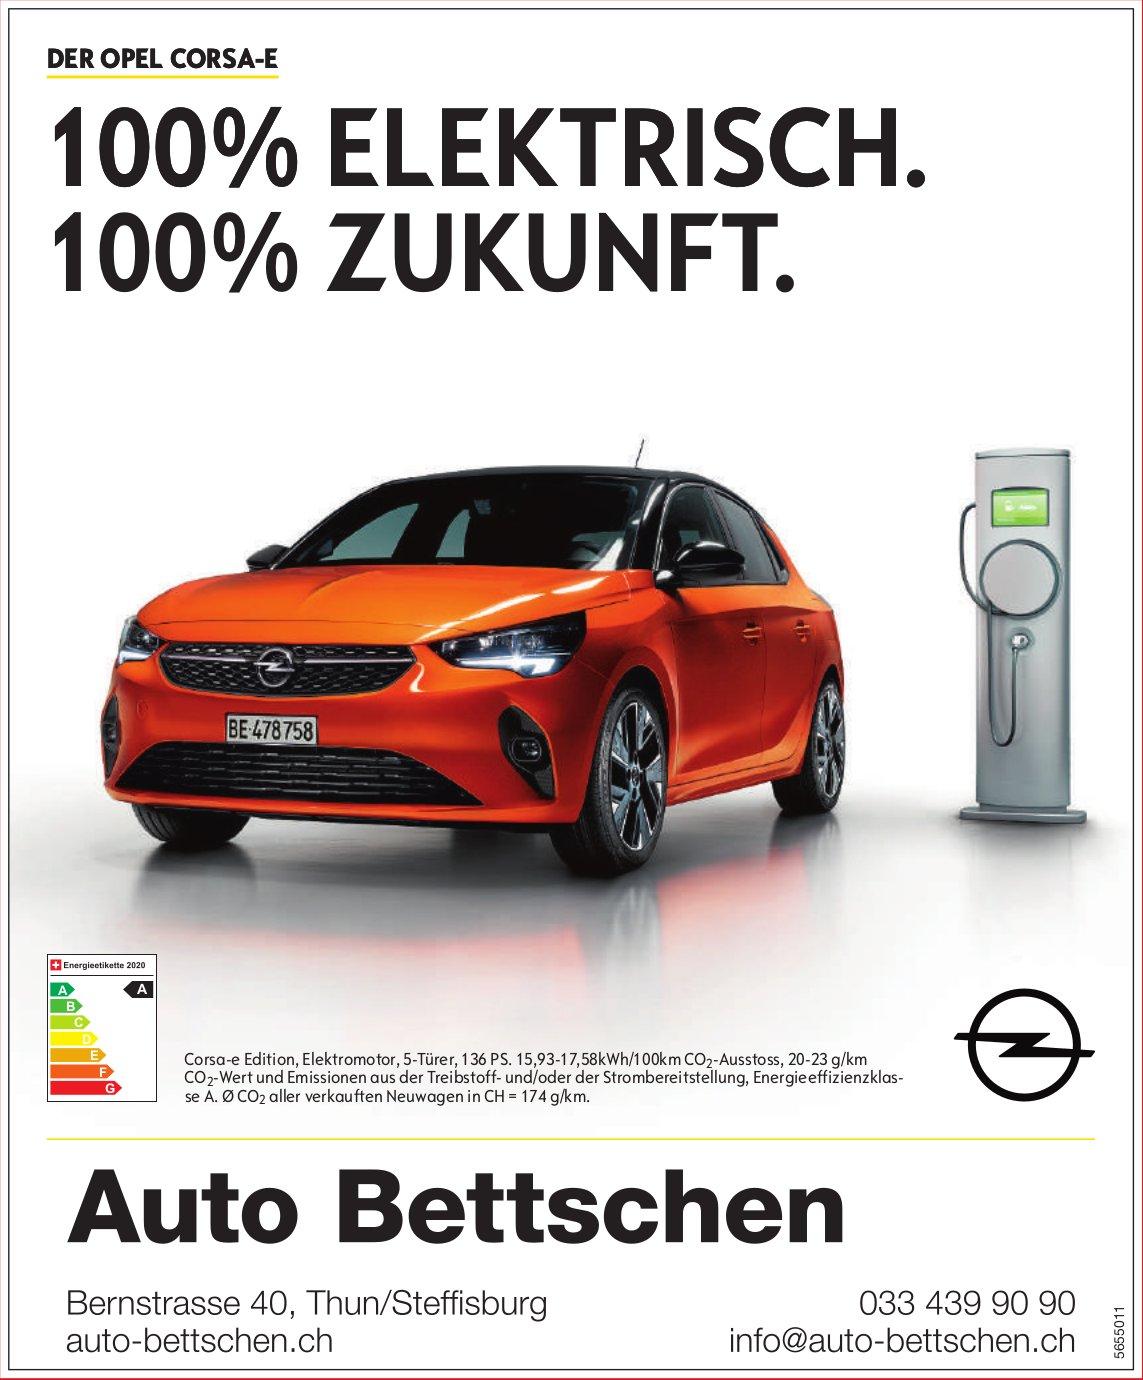 Auto Bettschen - Der Opel Corsa-E: 100% Elektrisch. 100% Zukunft.